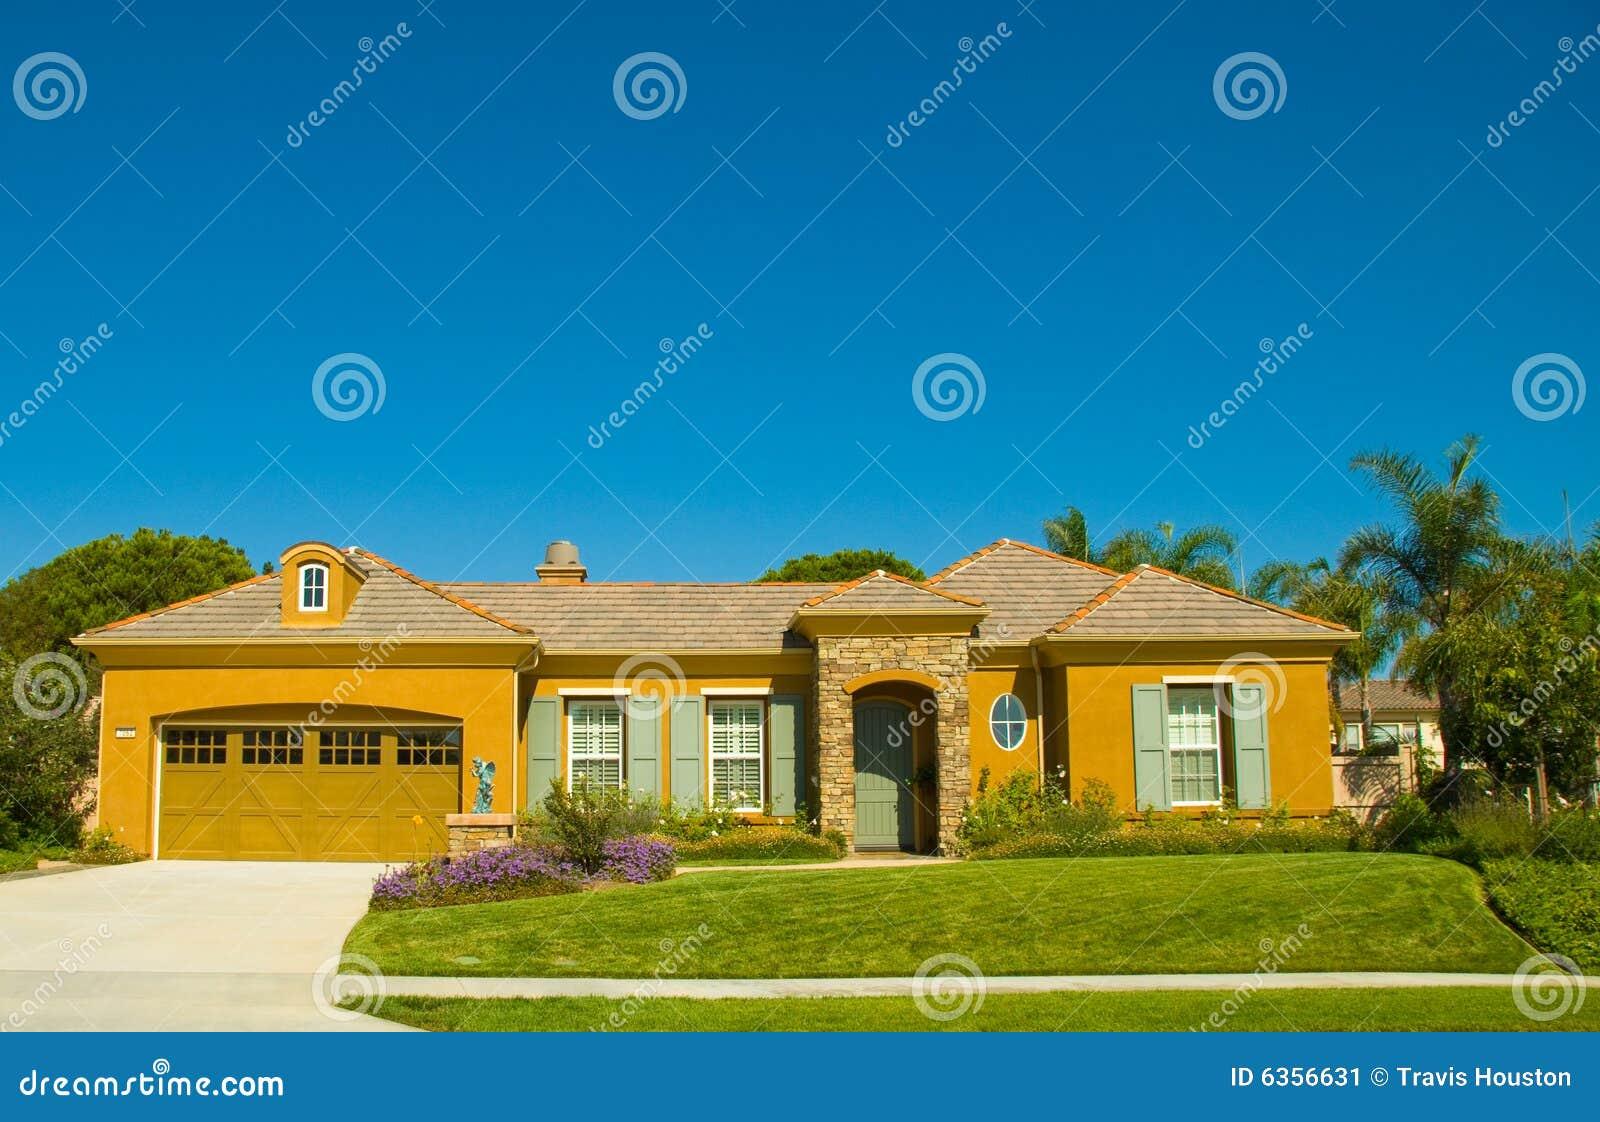 Sola casa ideal de la historia en una comunidad perfecta imagen de archivo imagen 6356631 - La casa ideal ...